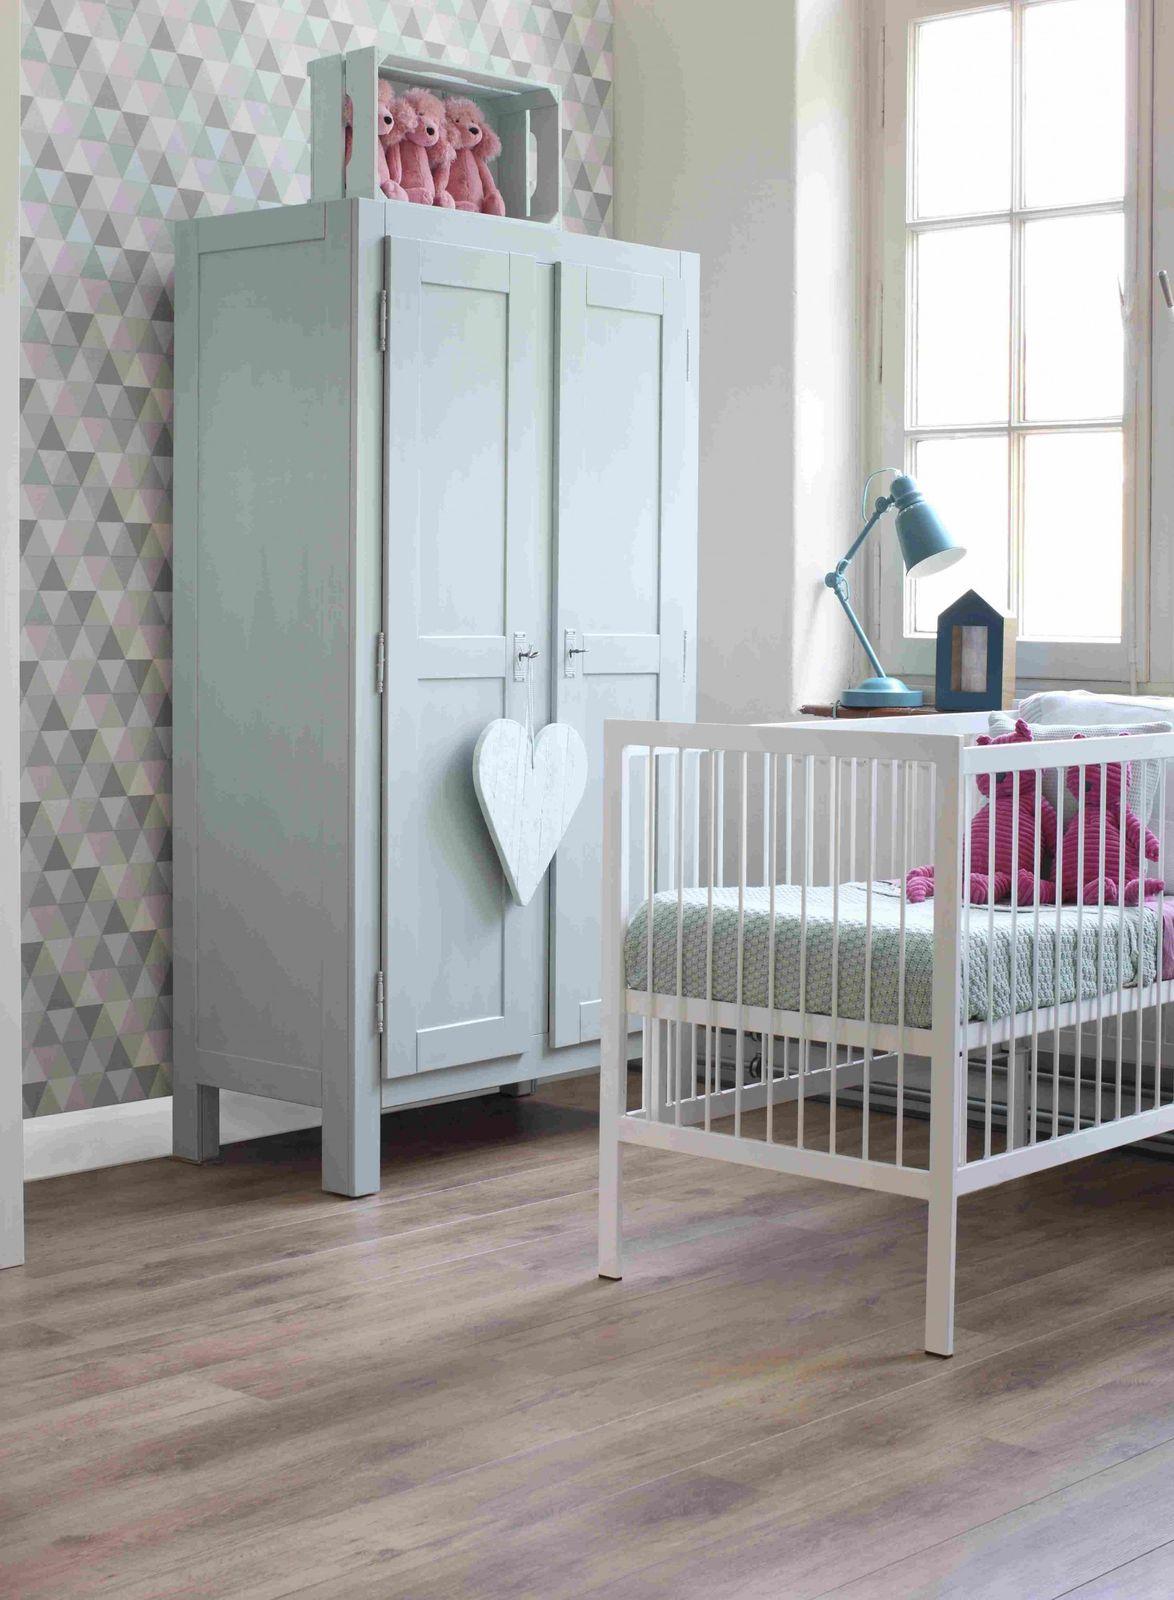 tapete vlies dreiecke gr n grau rosa everybody bonjour 128706. Black Bedroom Furniture Sets. Home Design Ideas